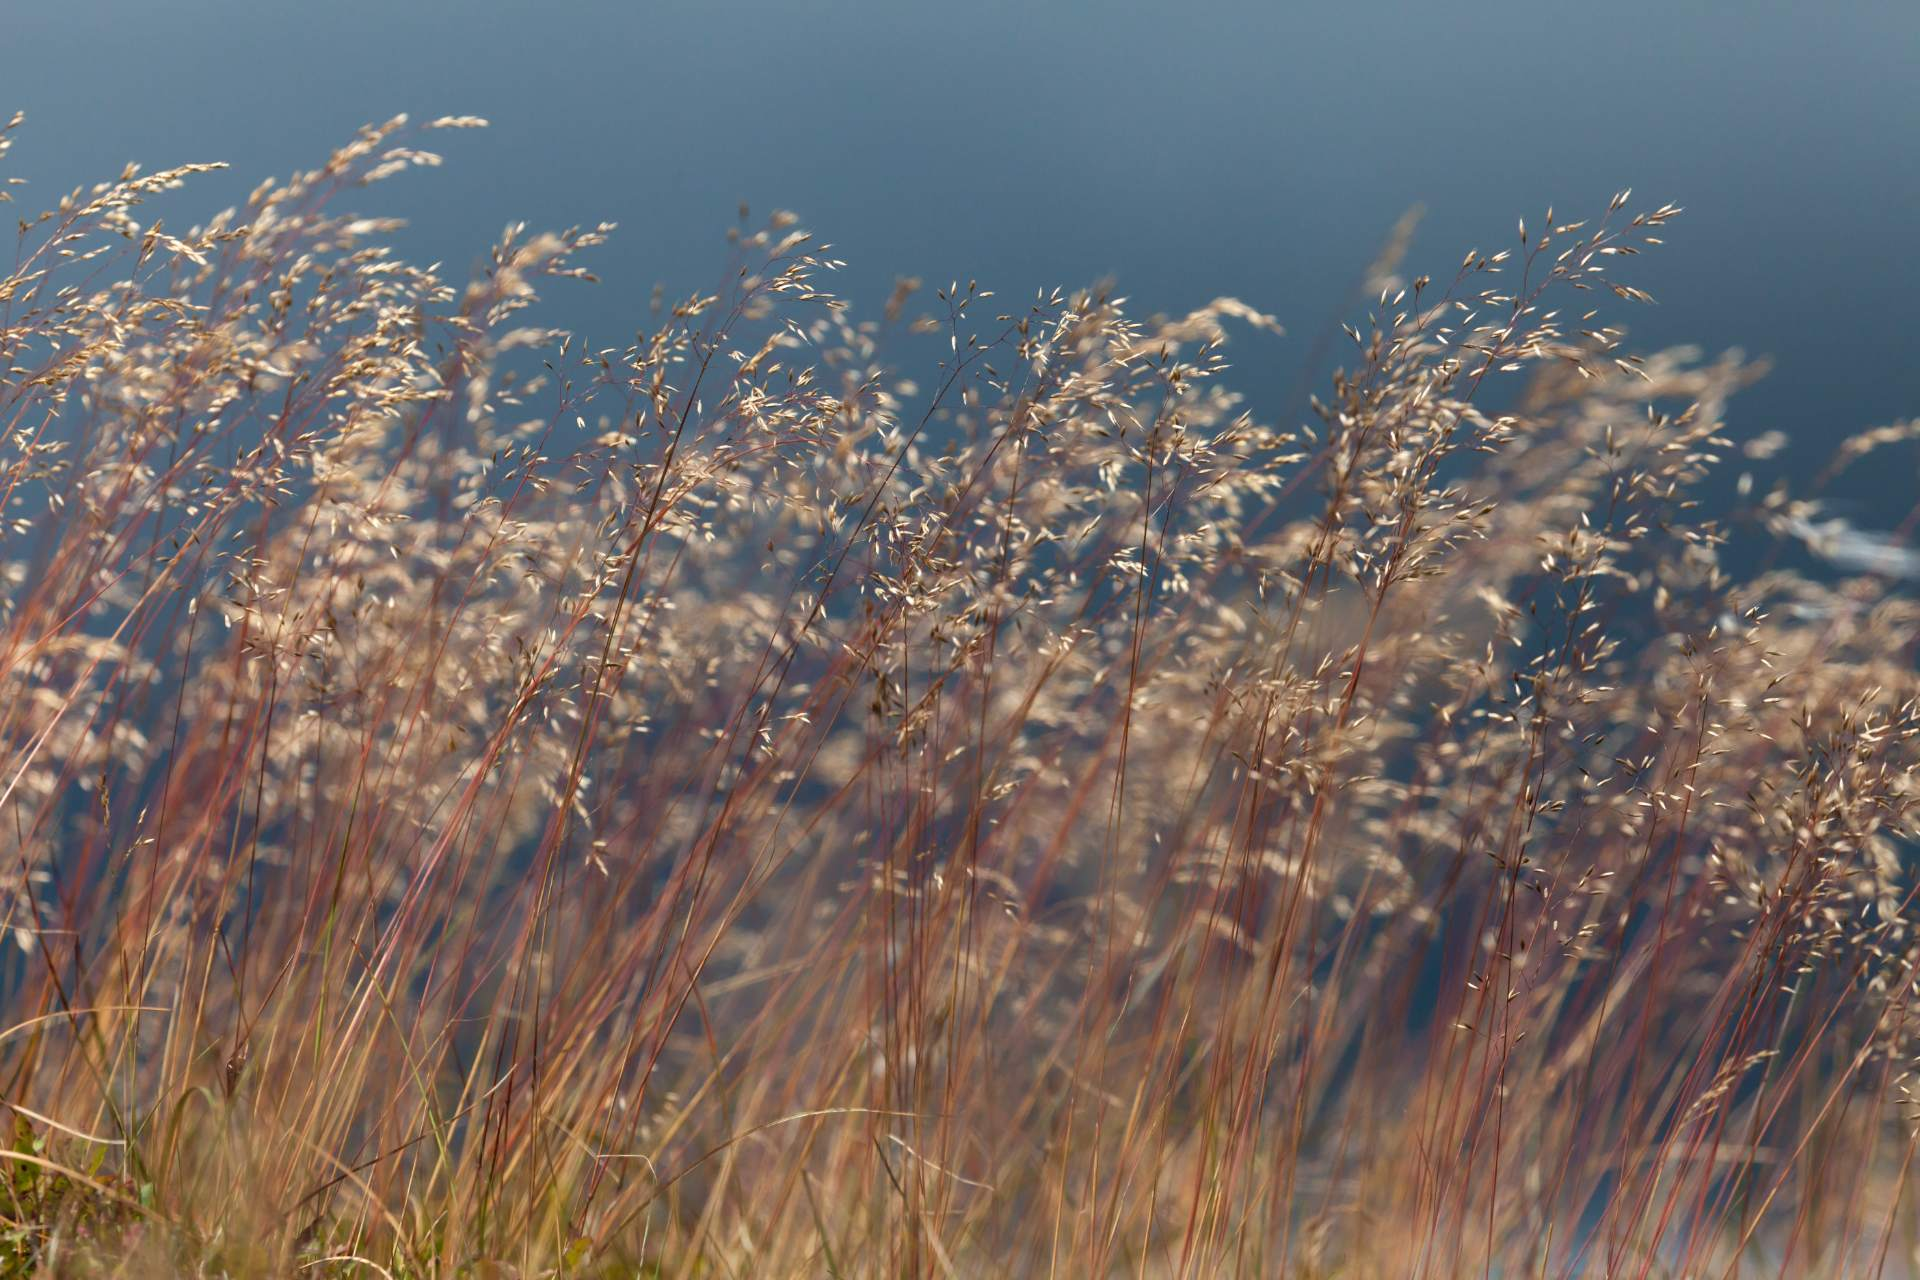 Wavy hair grass